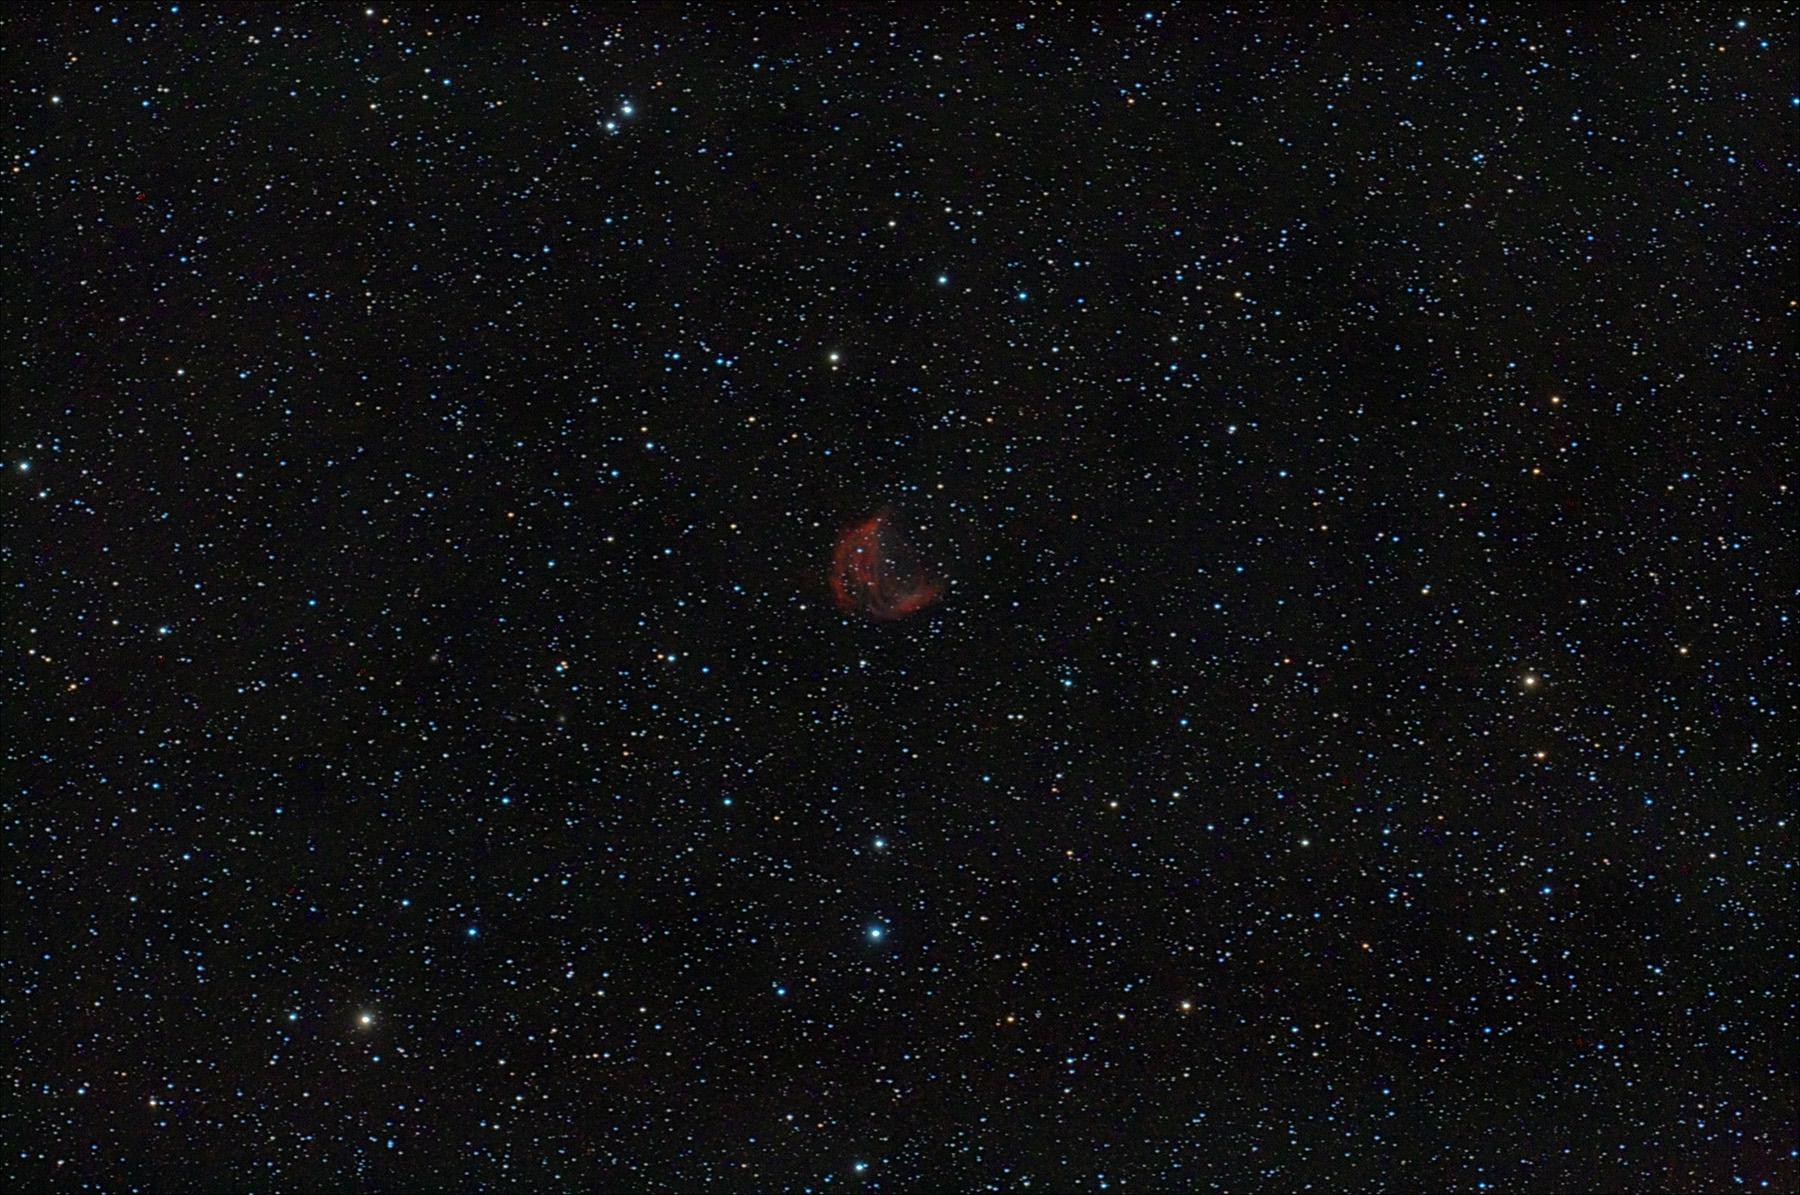 Nebulosa de la medusa Abell 21 / Sharpless 274